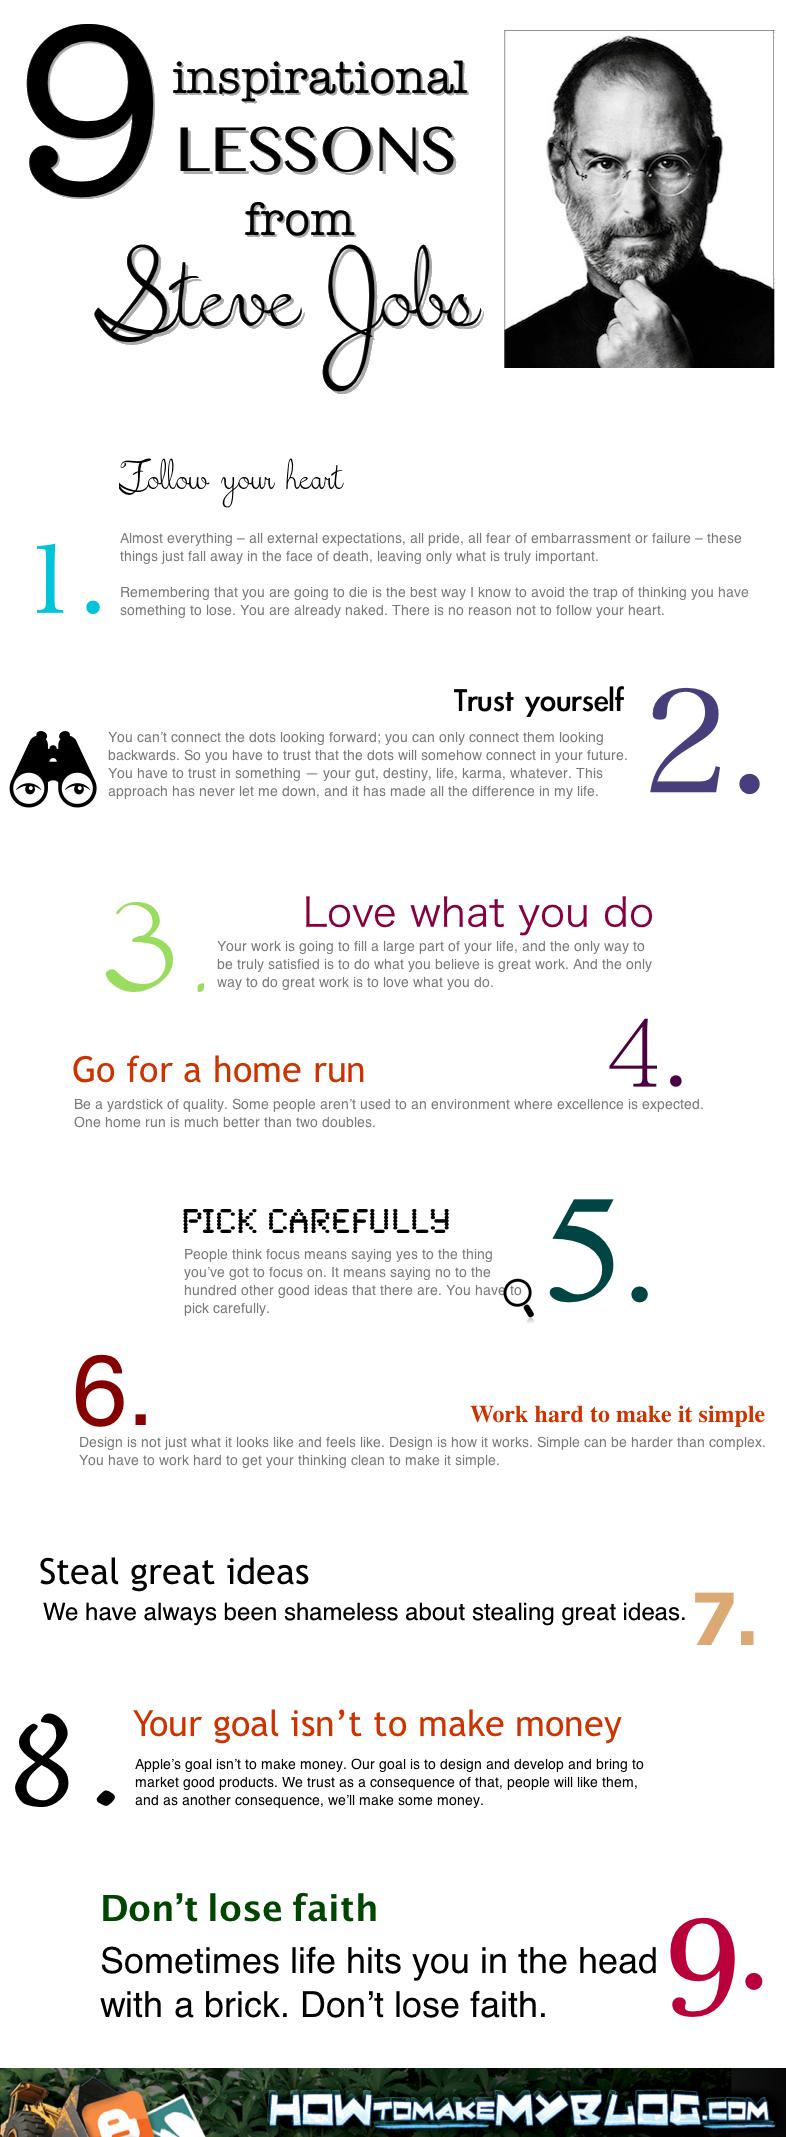 Lessons from Steve Jobs